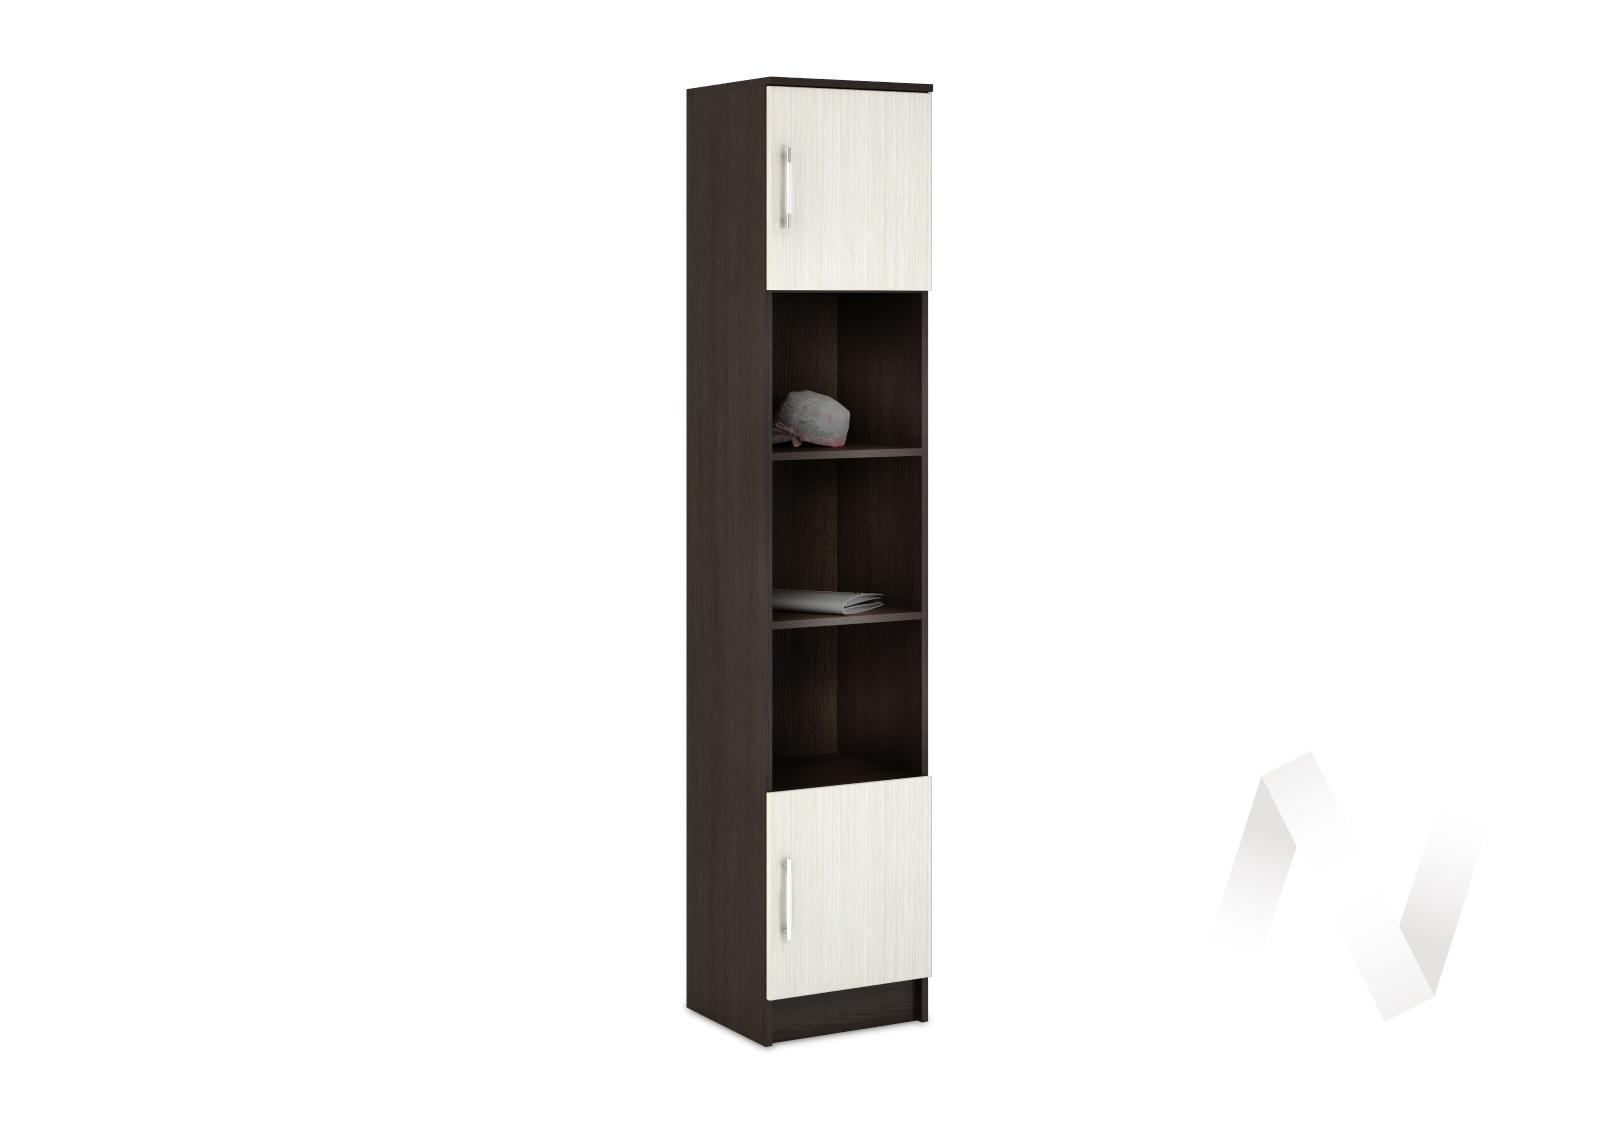 Шкаф пенал Машенька (дуб беленый) ШК-100